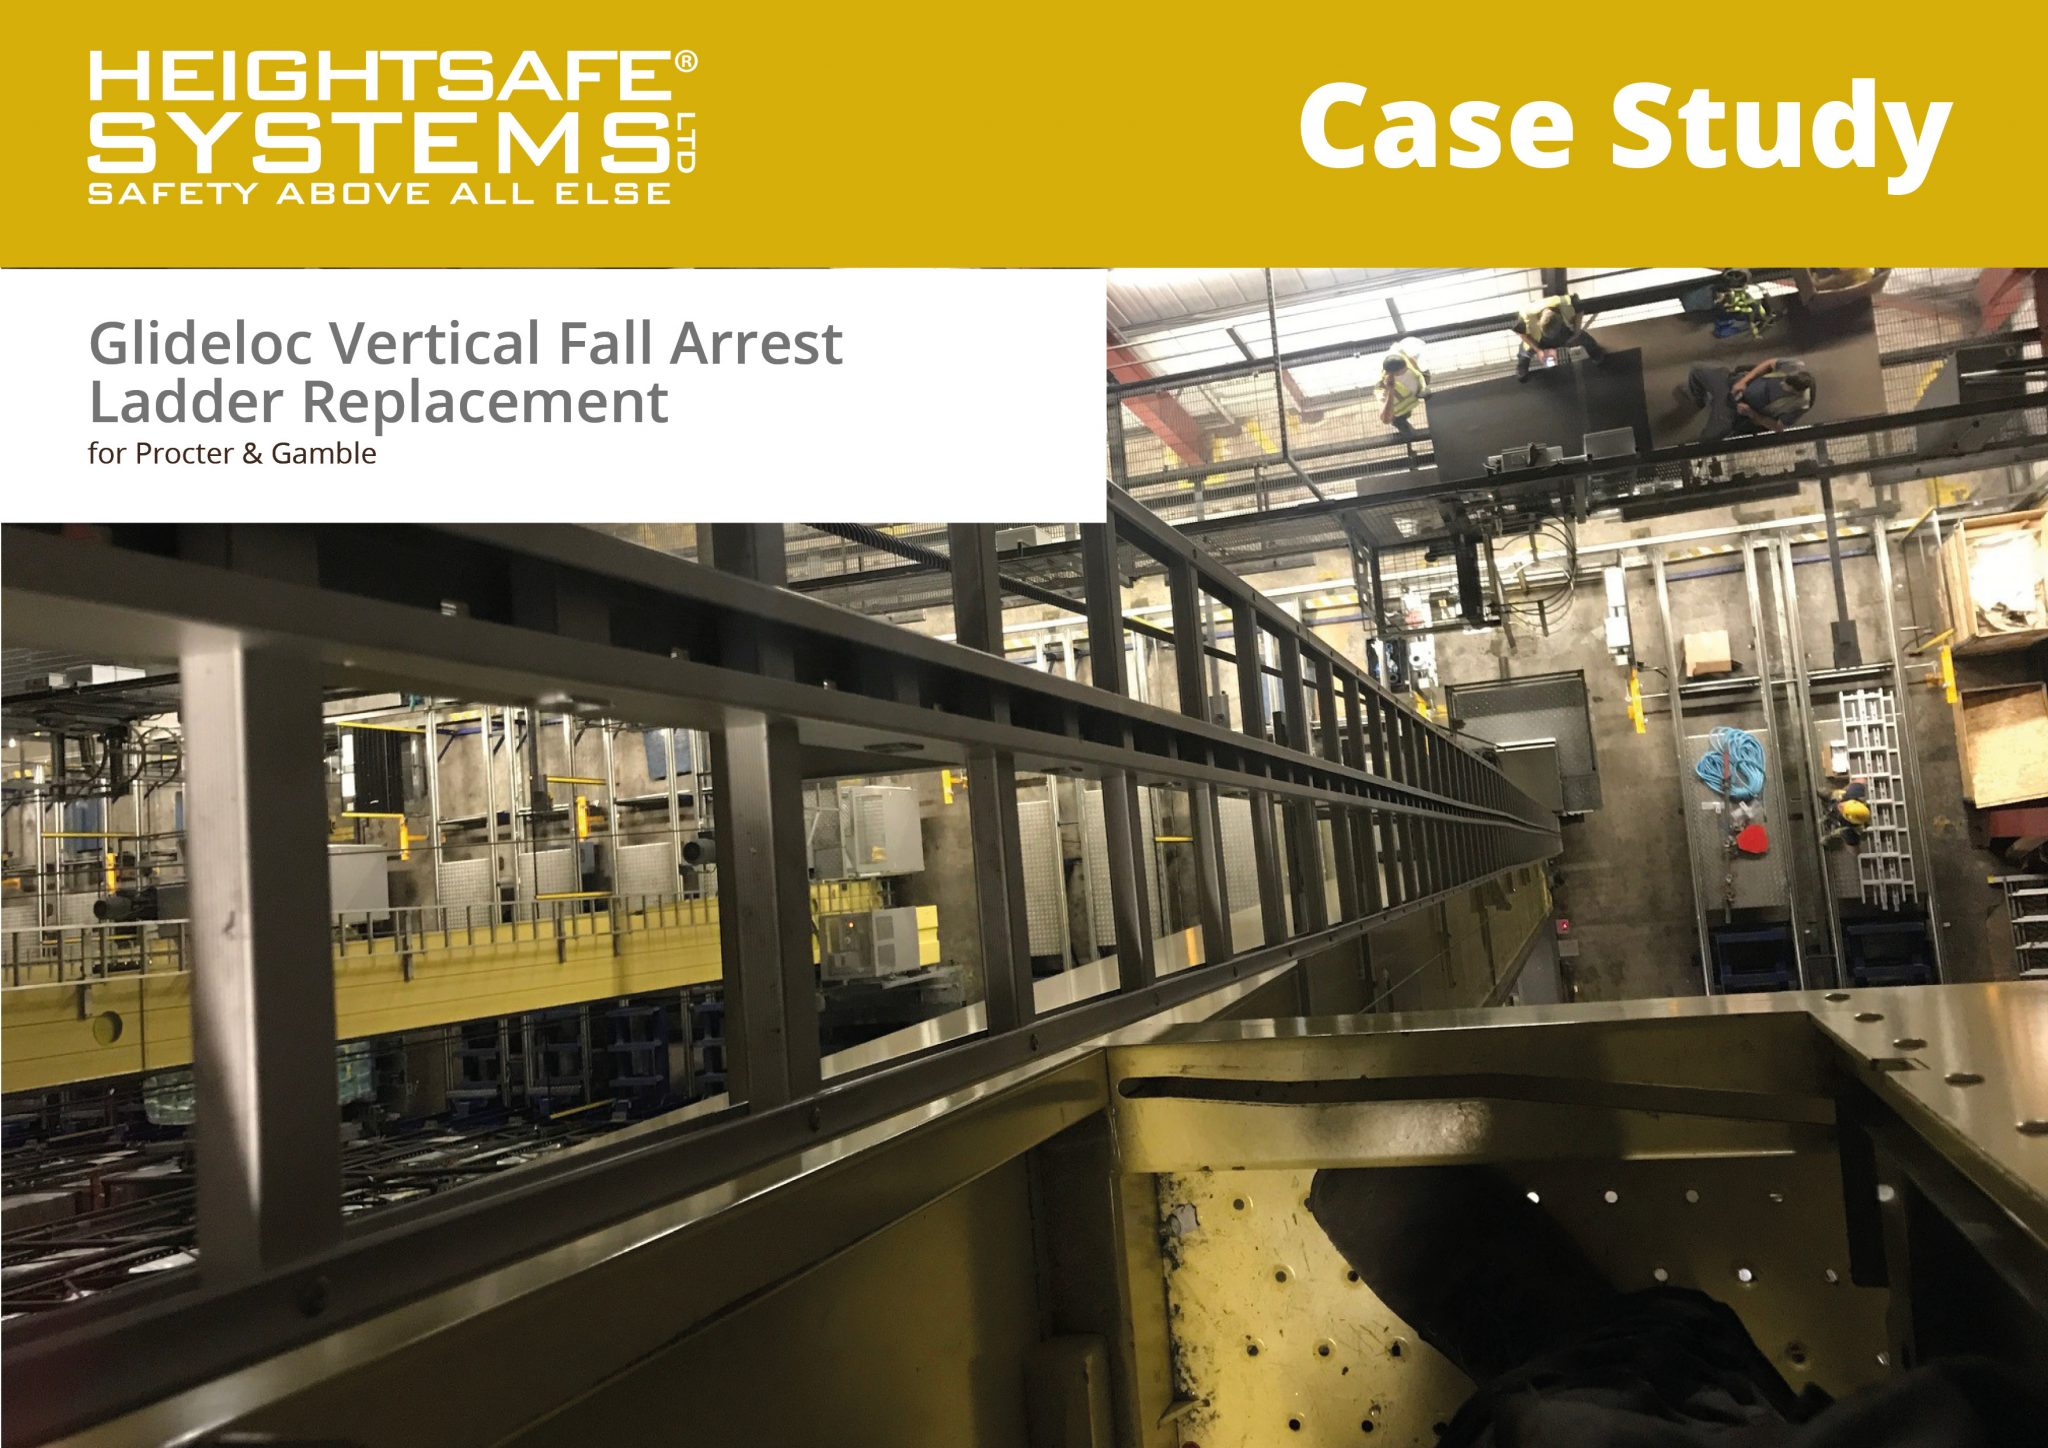 case study glideloc vertical fall arrest ladder replacement p g